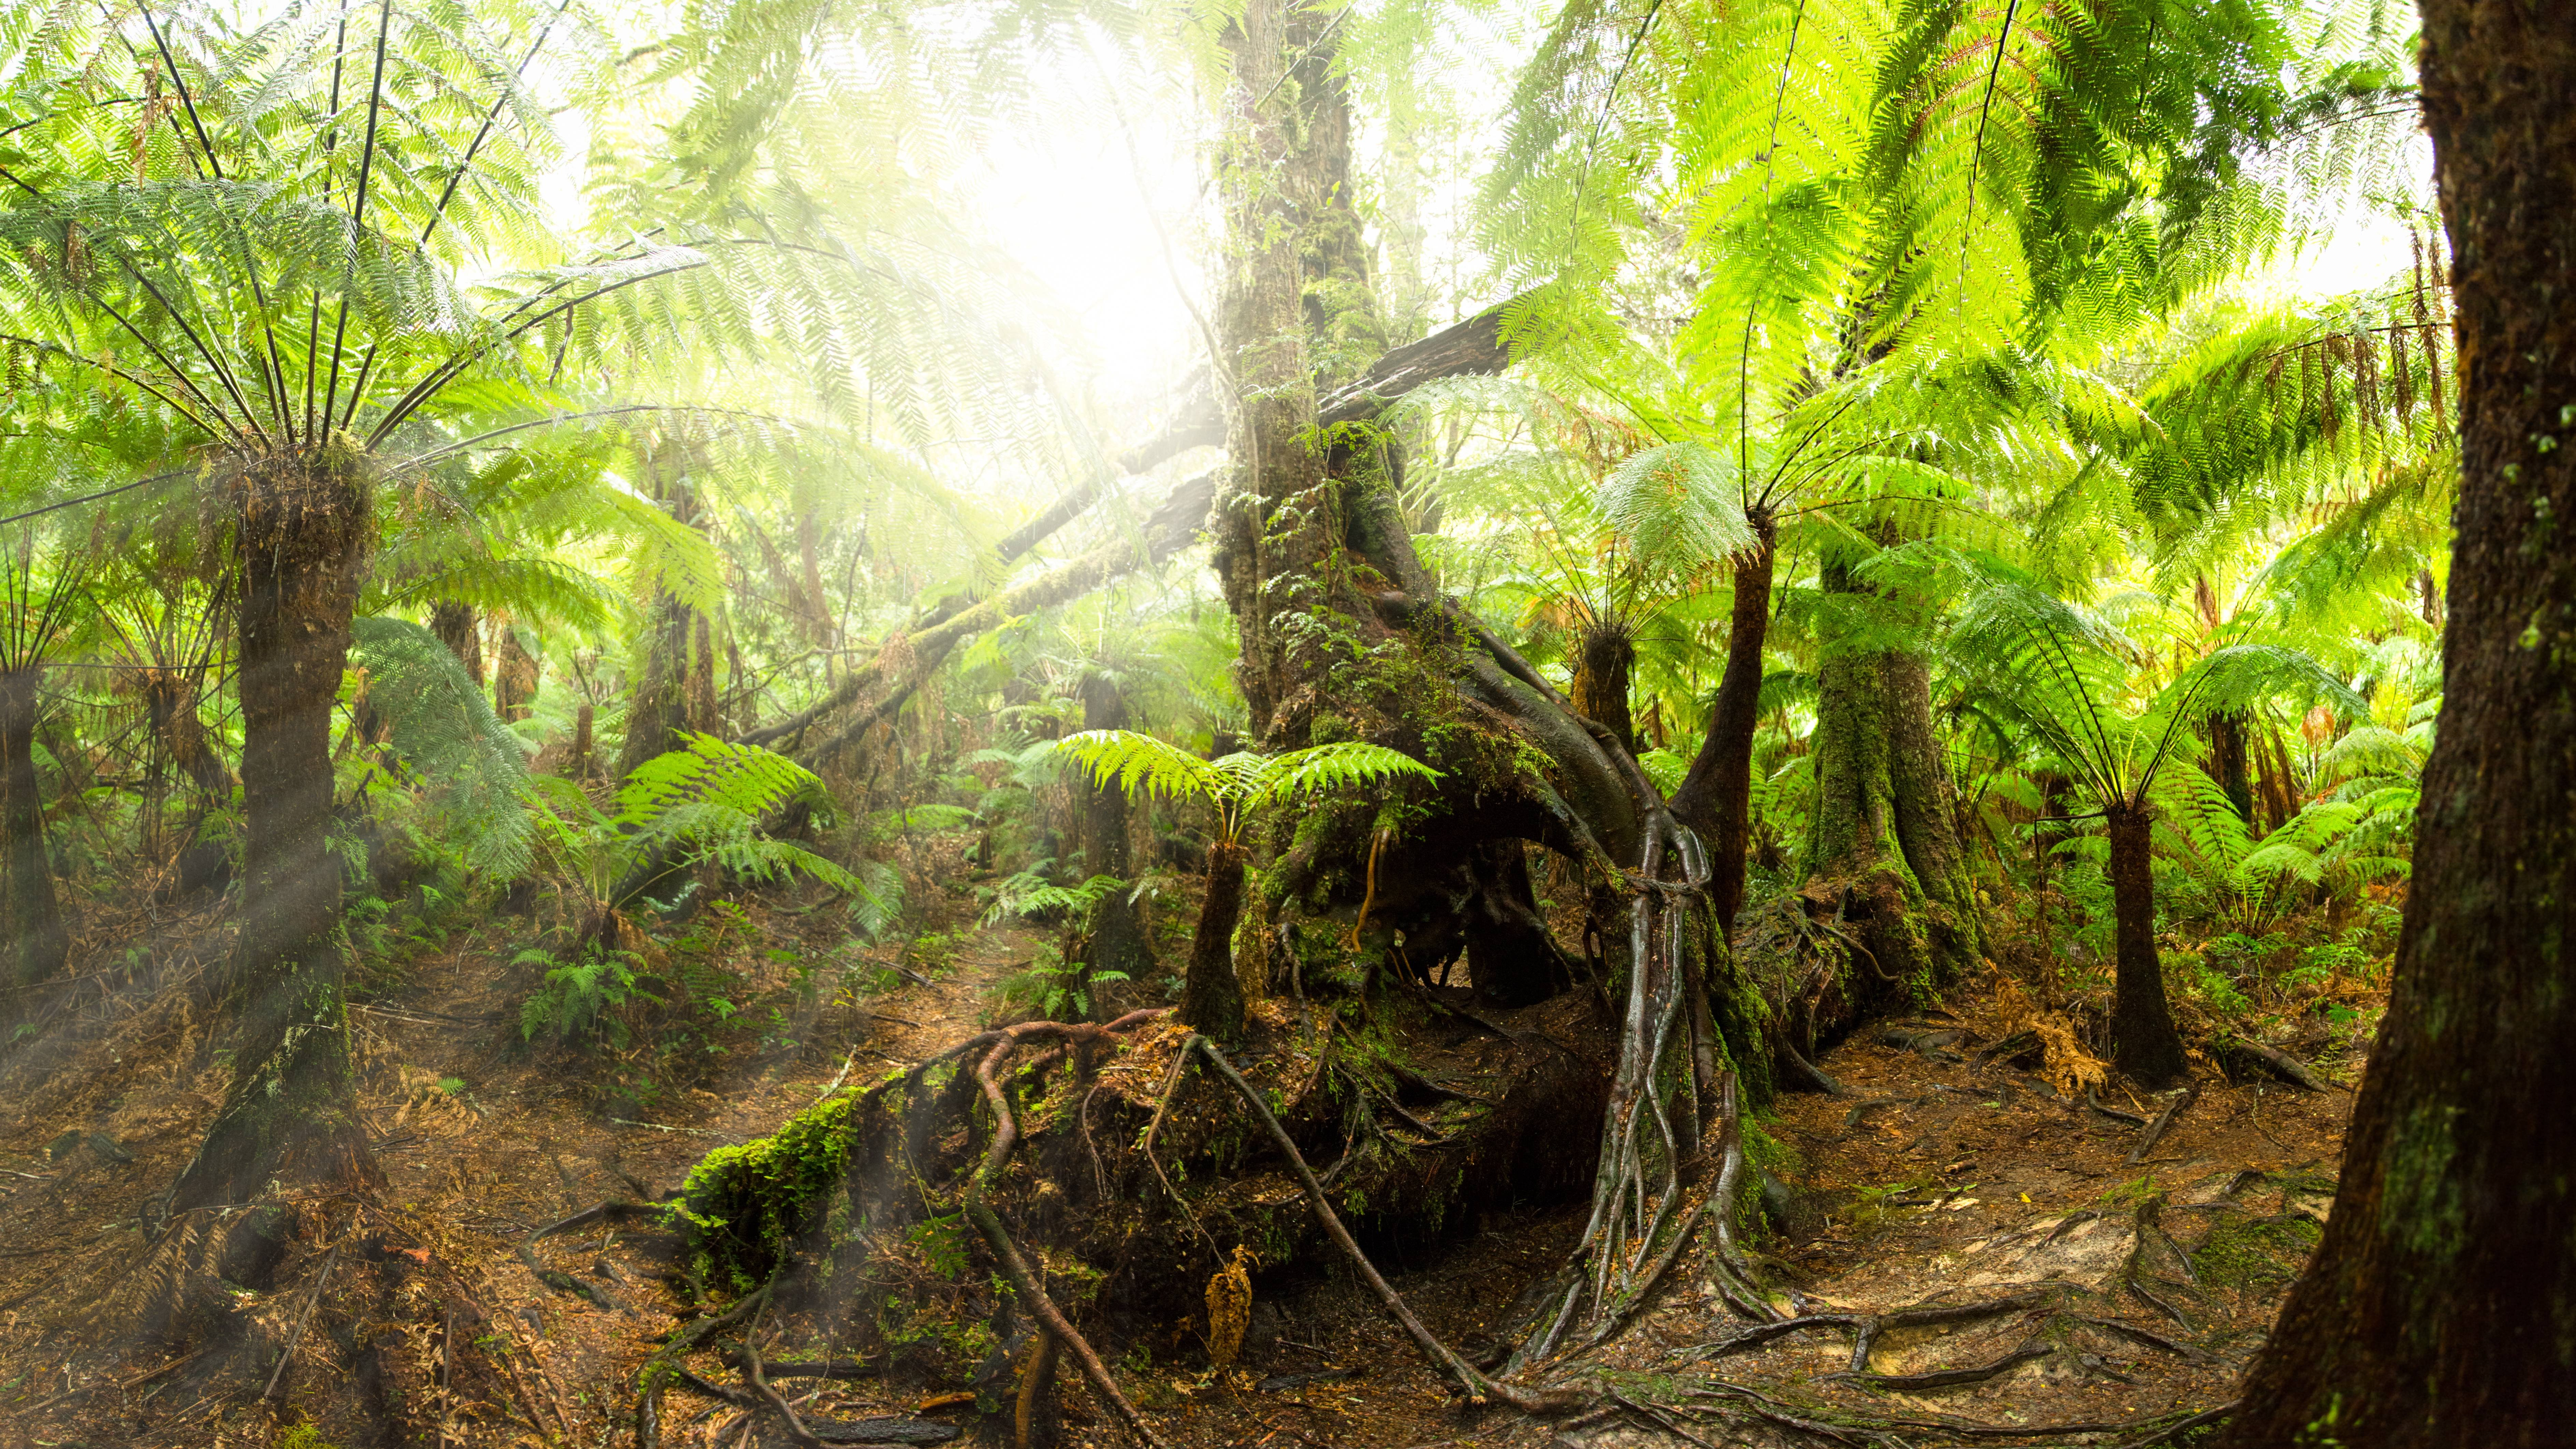 Rainforest 4k Wallpapers For Your Desktop Or Mobile Screen